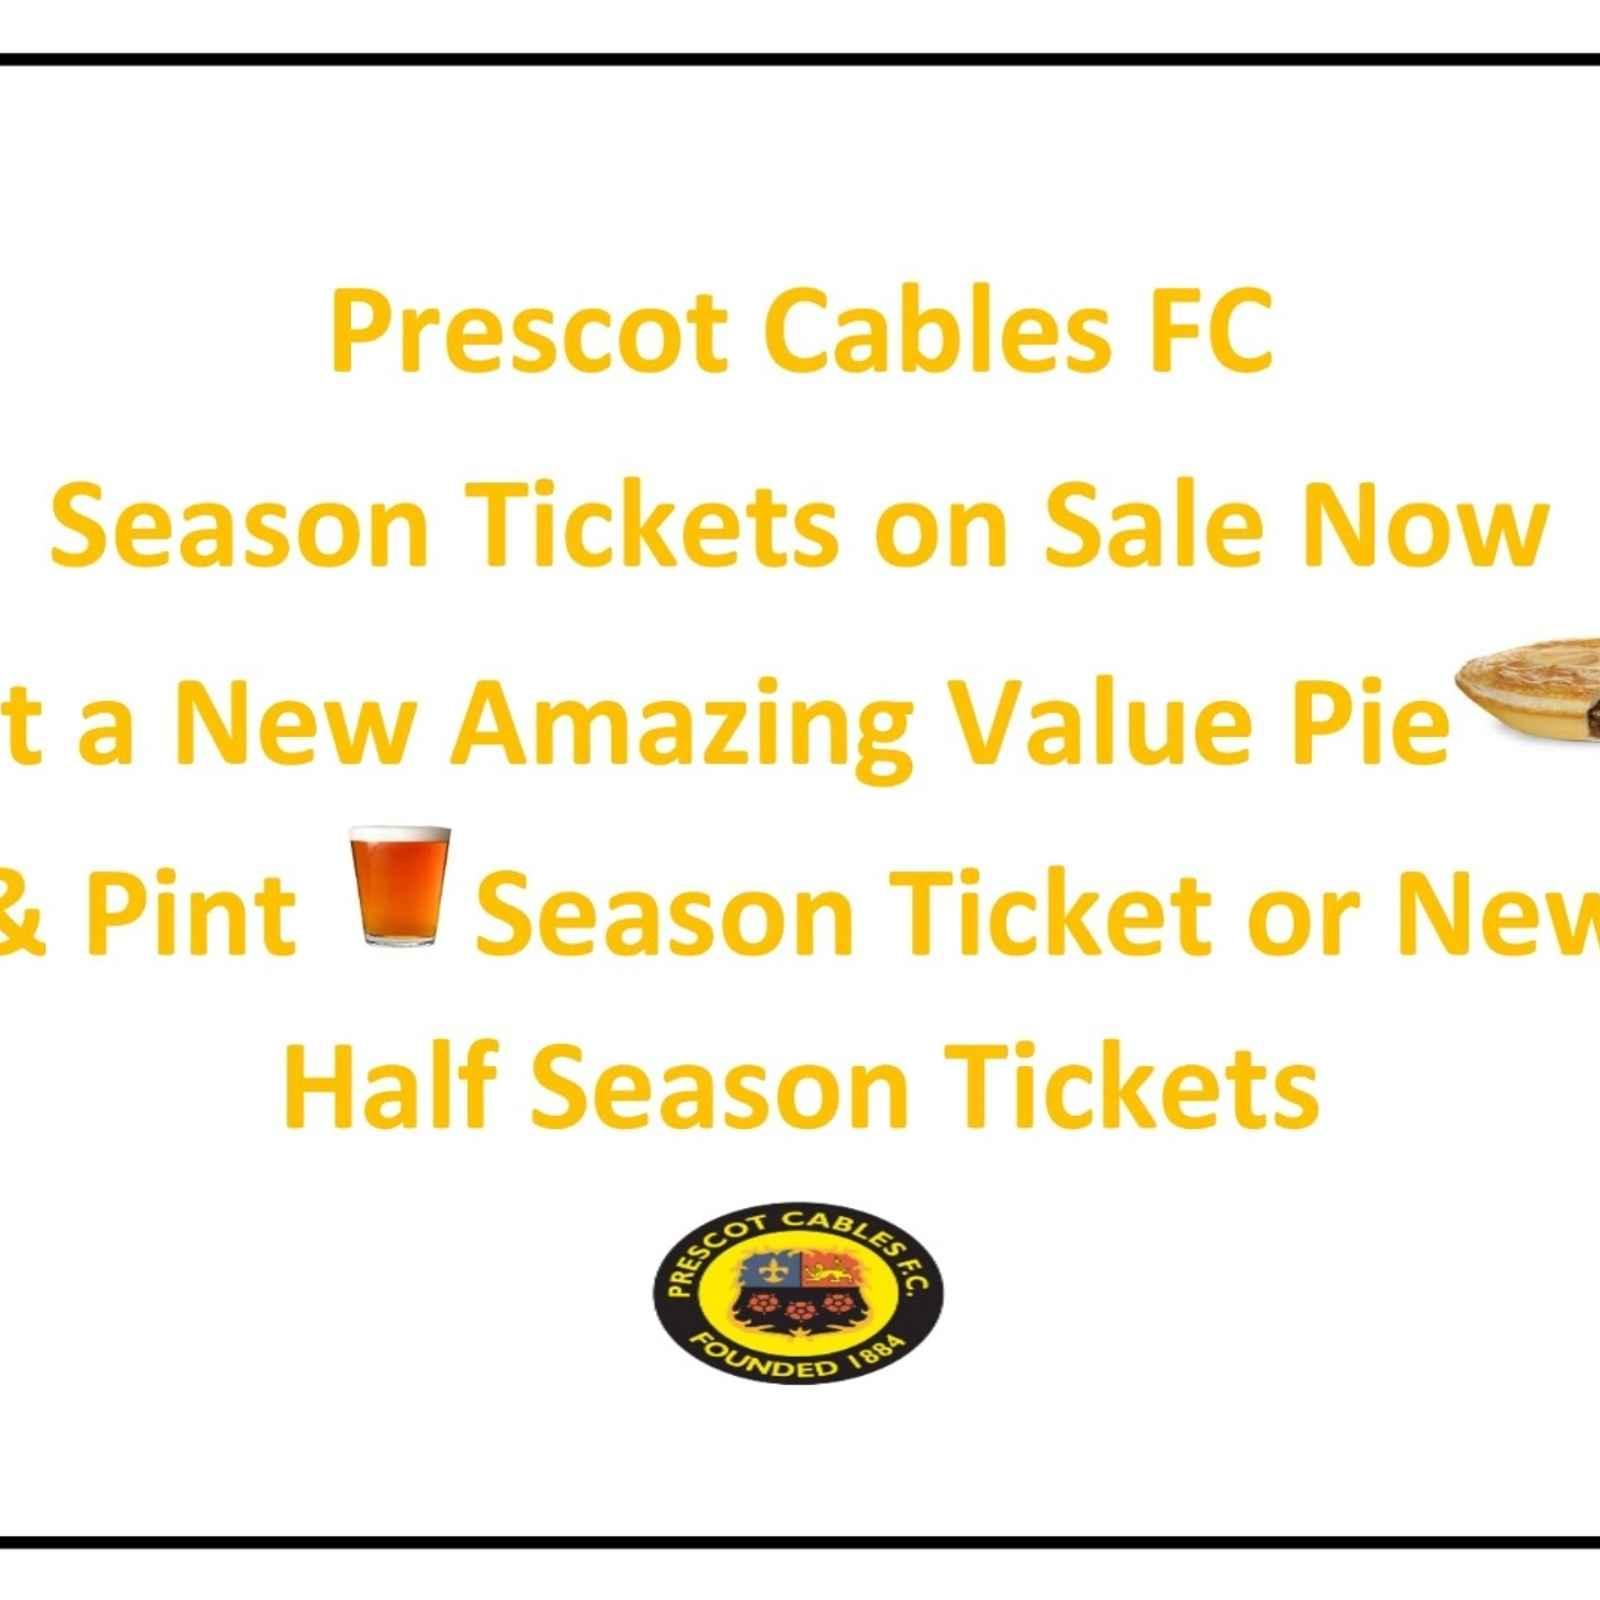 Season Tickets Deadline 31st July Save 18%!!!